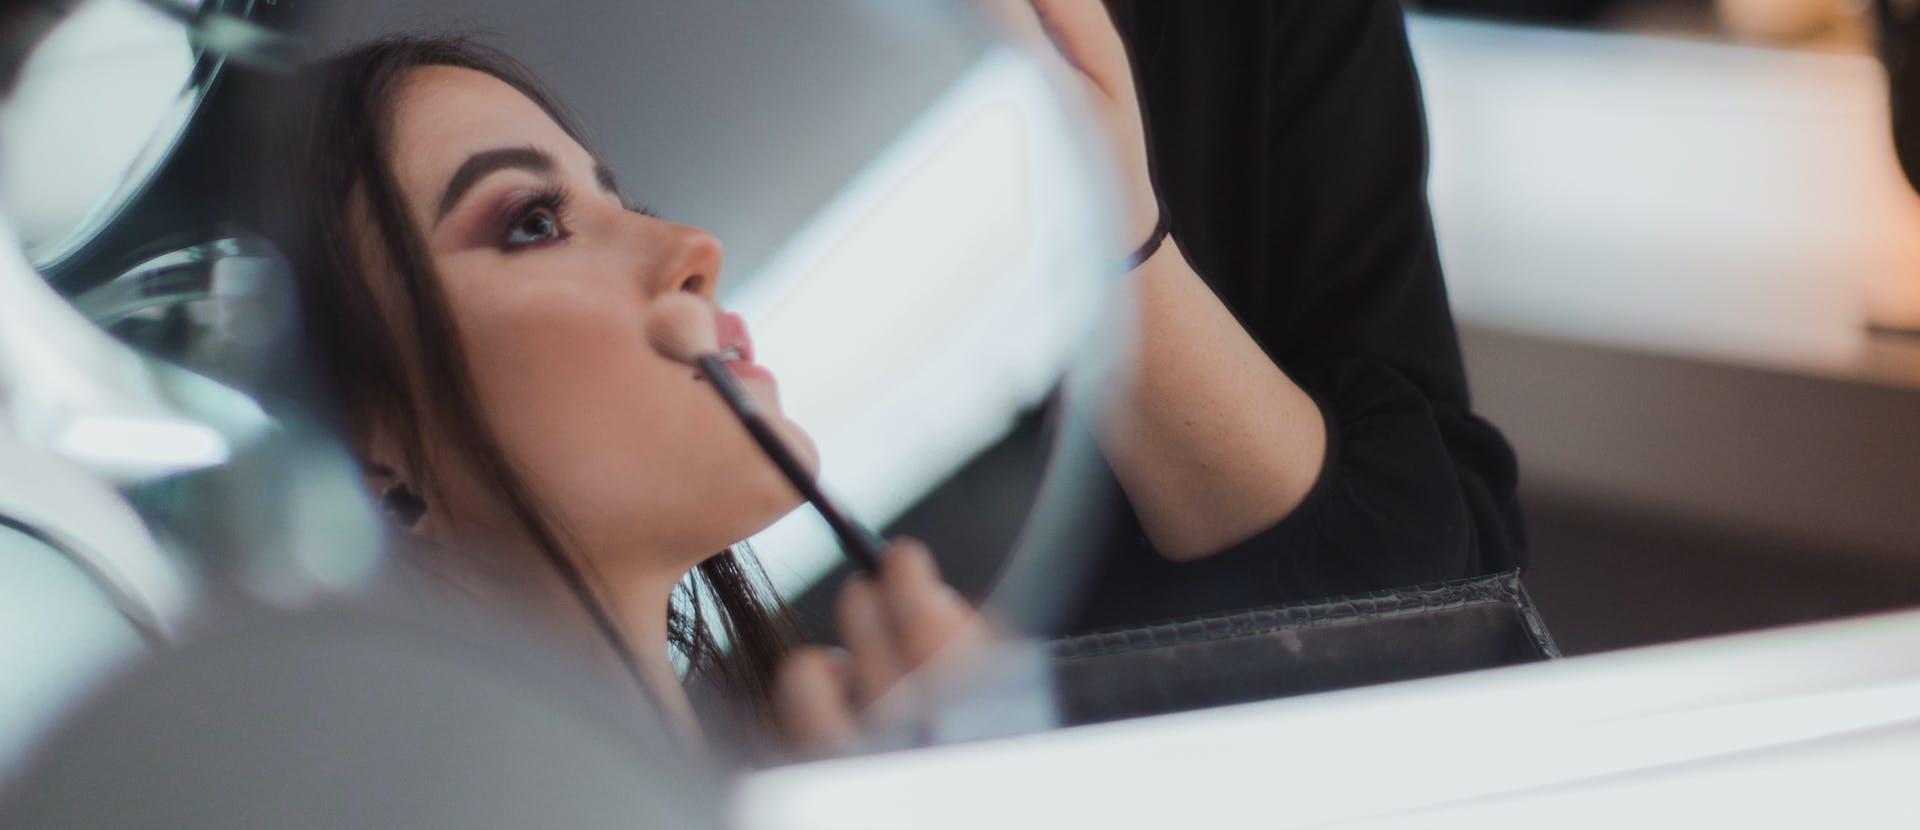 Come diventare Make Up Artist - L'Officie ltalia